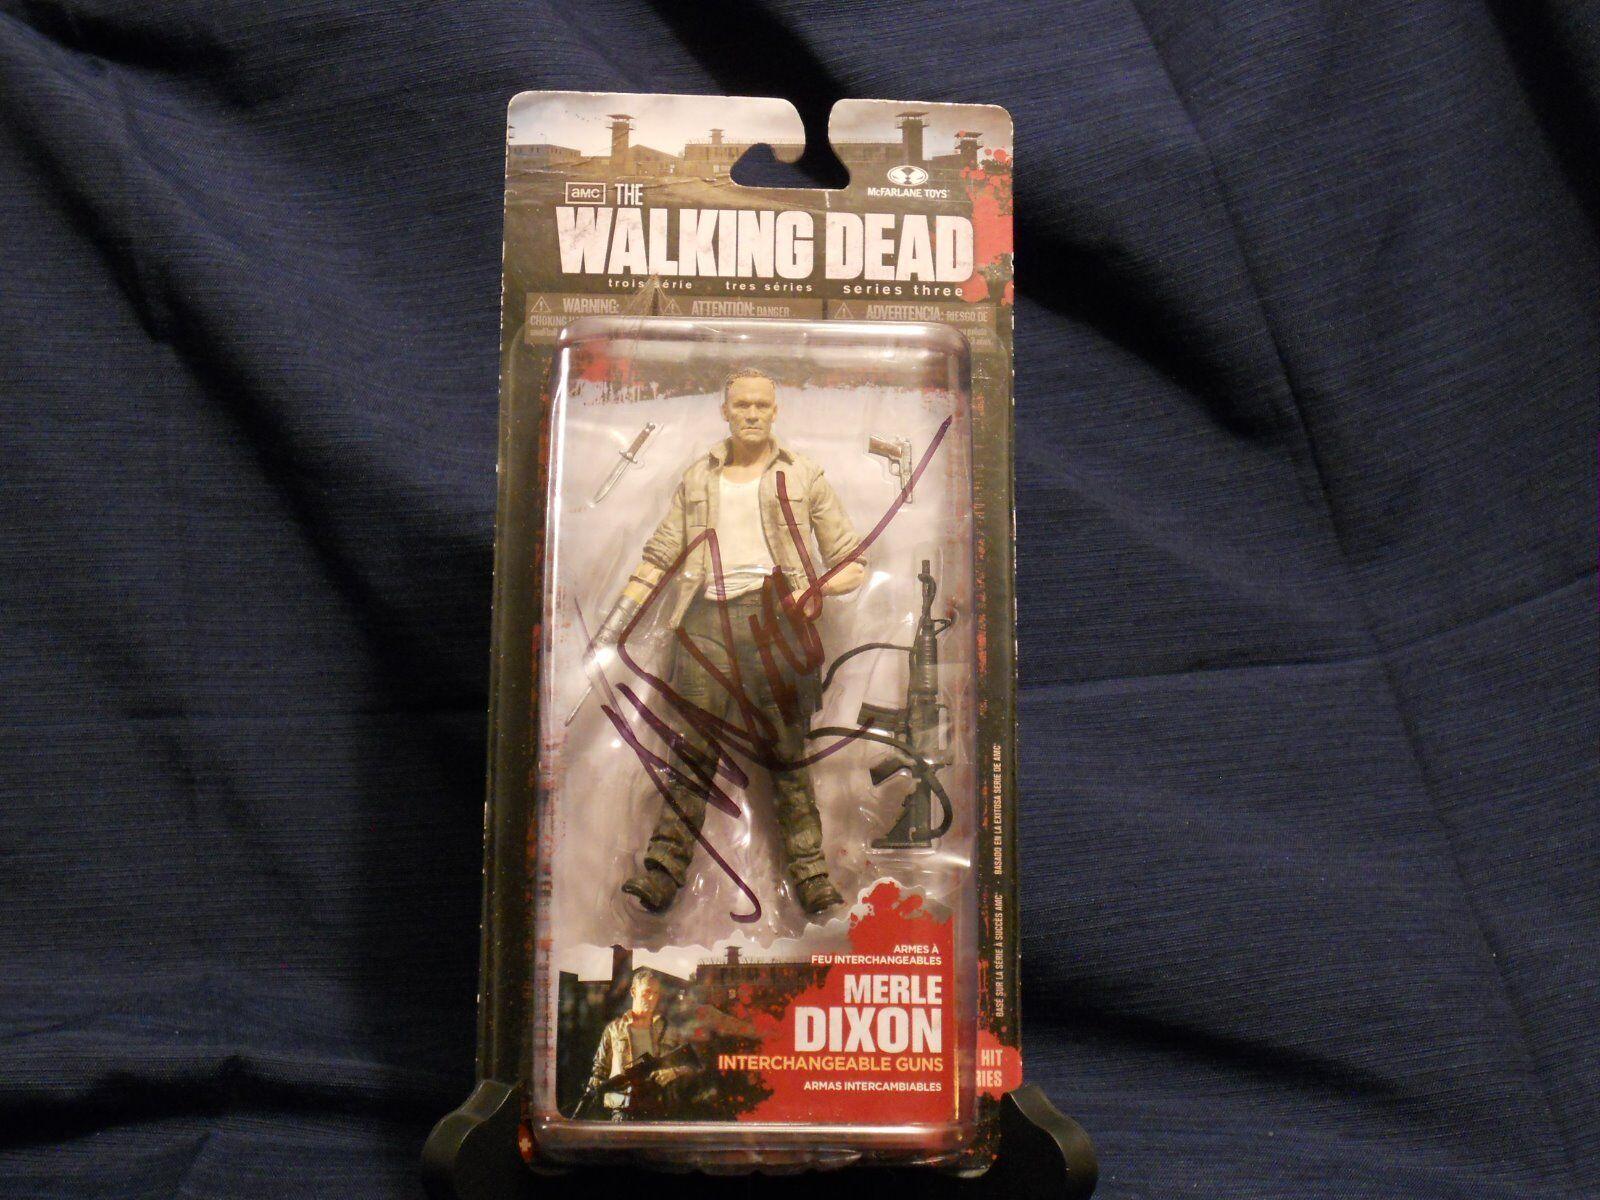 McFarlane Toys AMC The Walking Dead Series 3 - Merle Dixon Figure (Autographed)